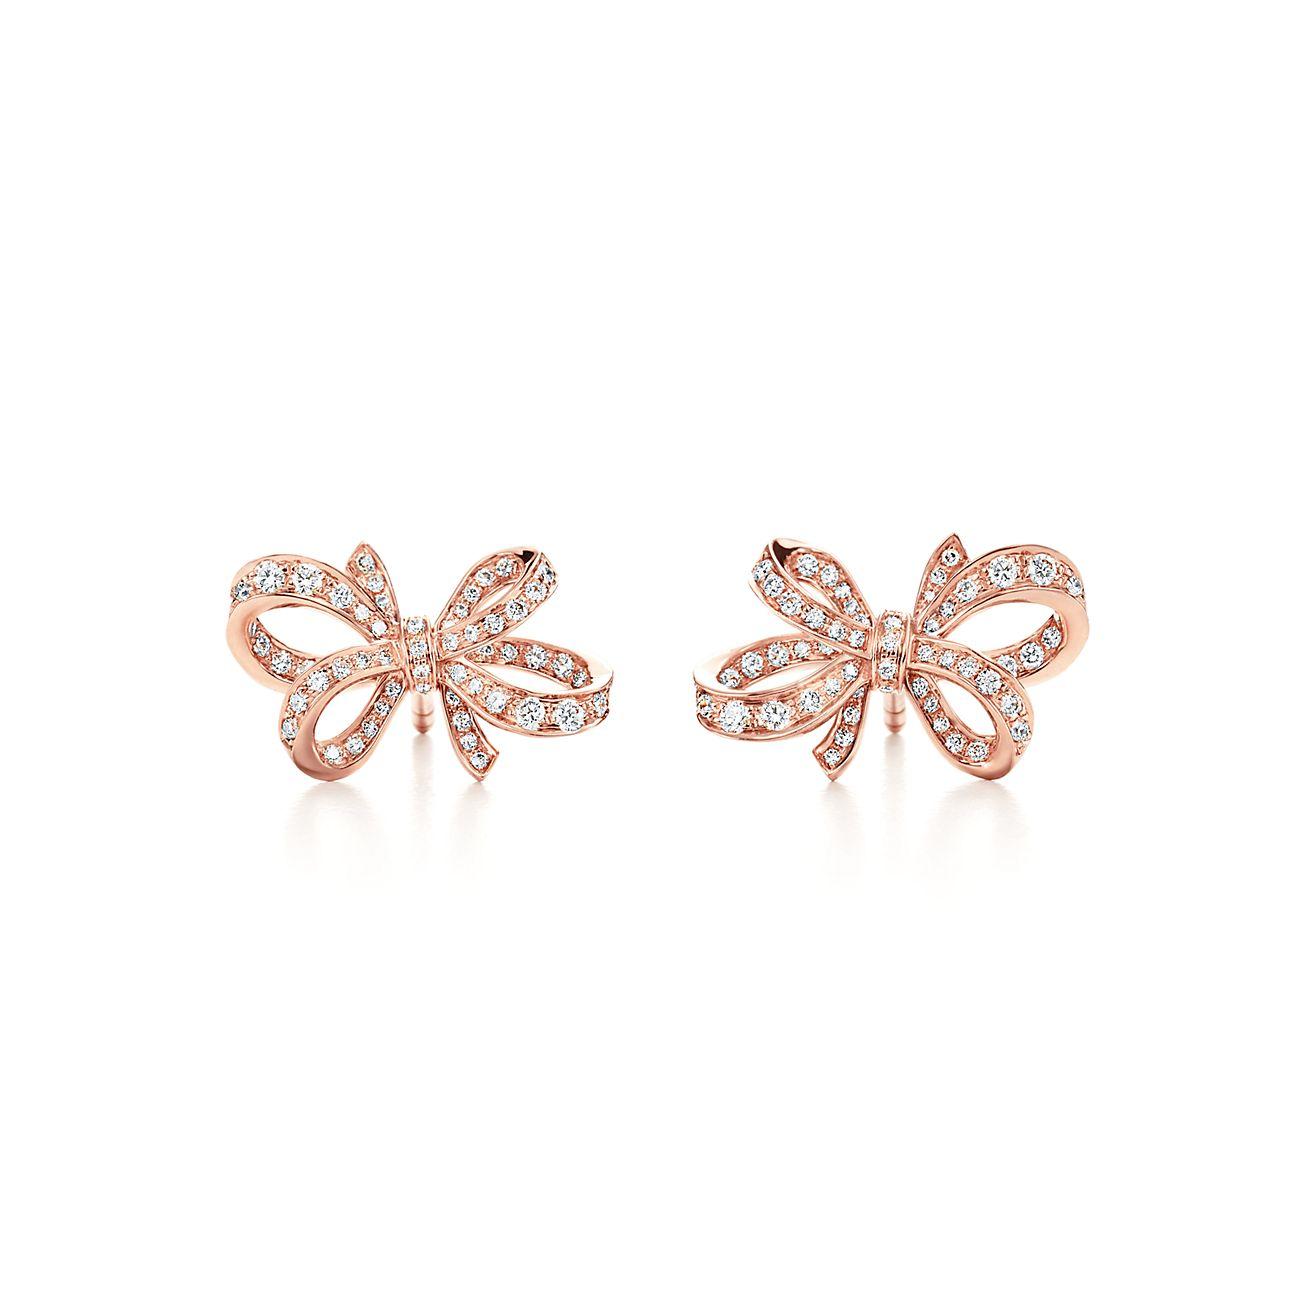 New Tiffany Bow Ribbon Earrings In 18k Rose Gold With Diamonds, Mini